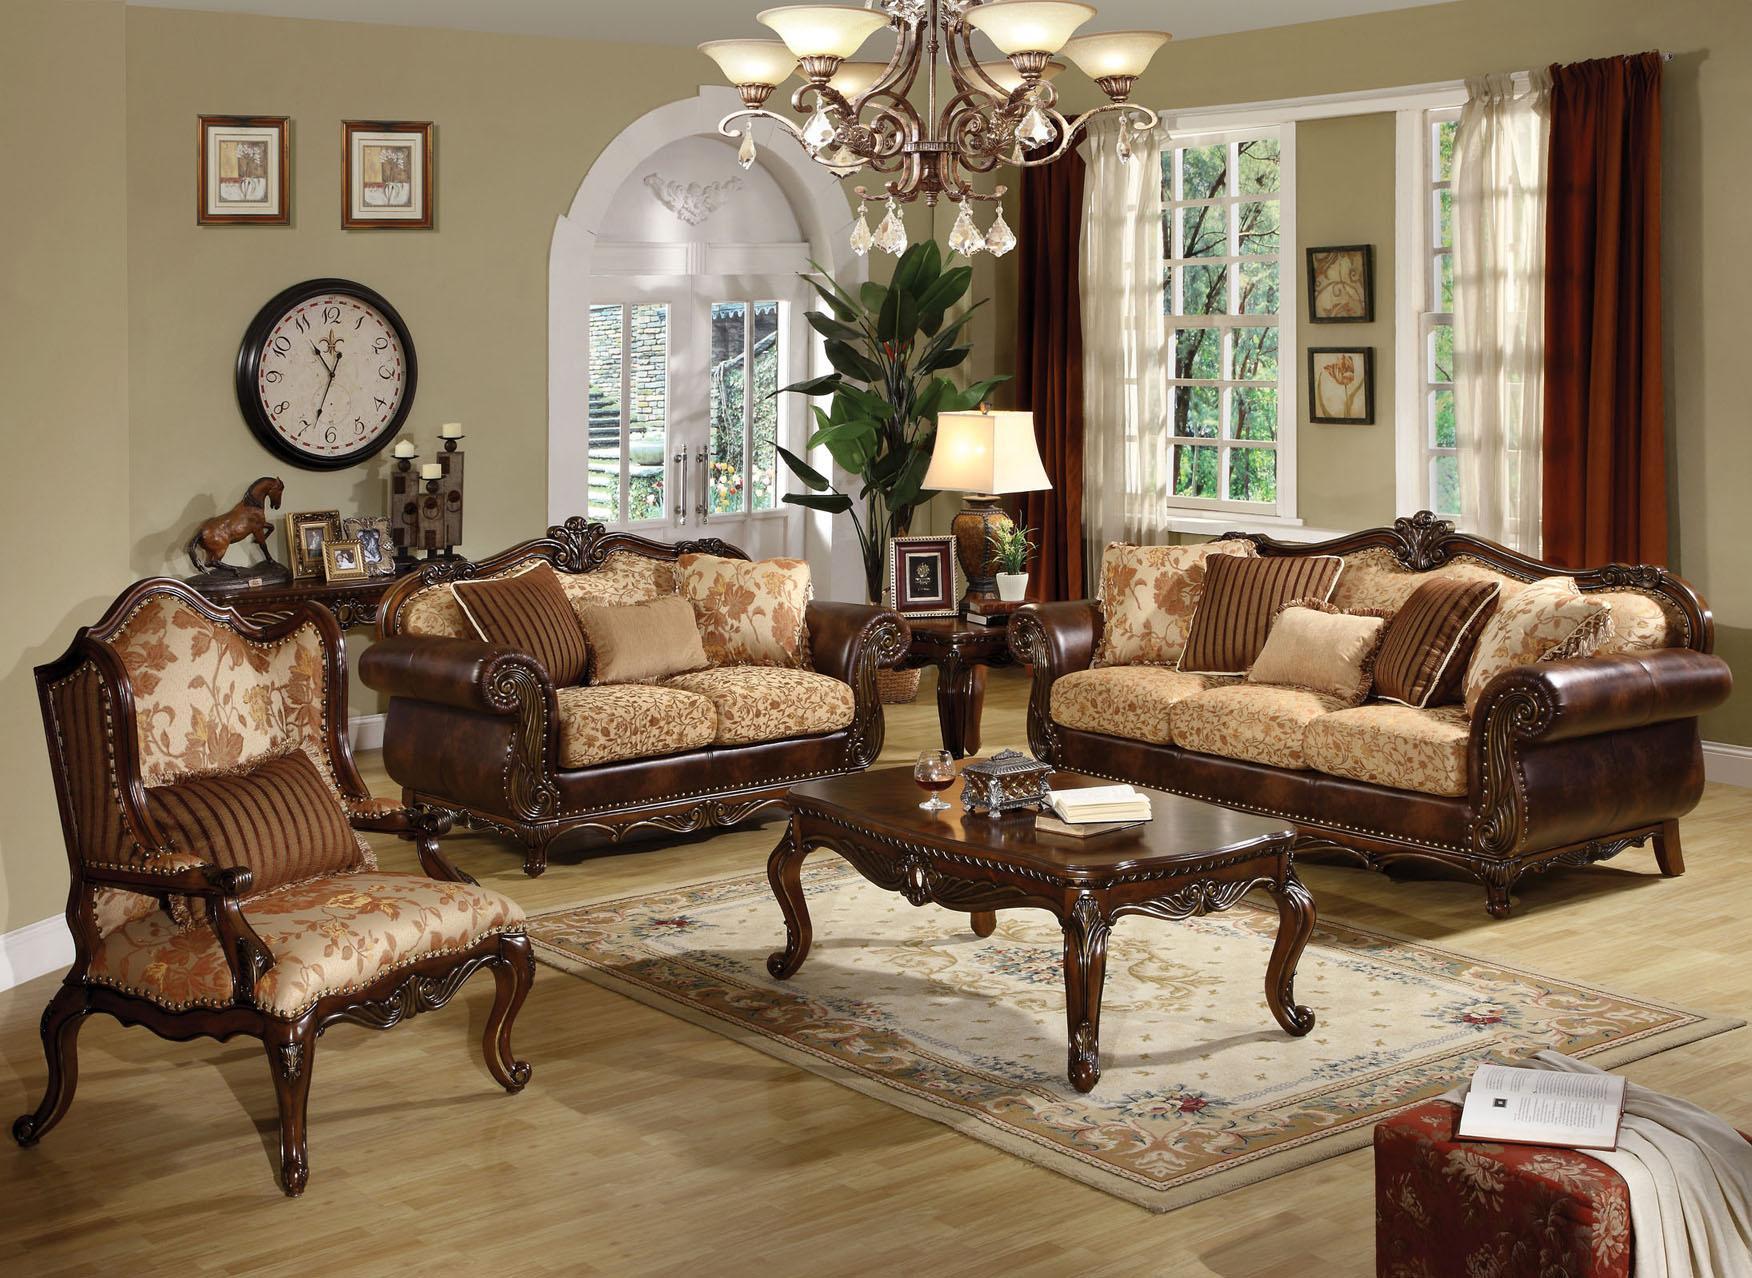 Acme Furniture Remington  Stationary Living Room Group - Item Number: 202 Stationary Living Room Group